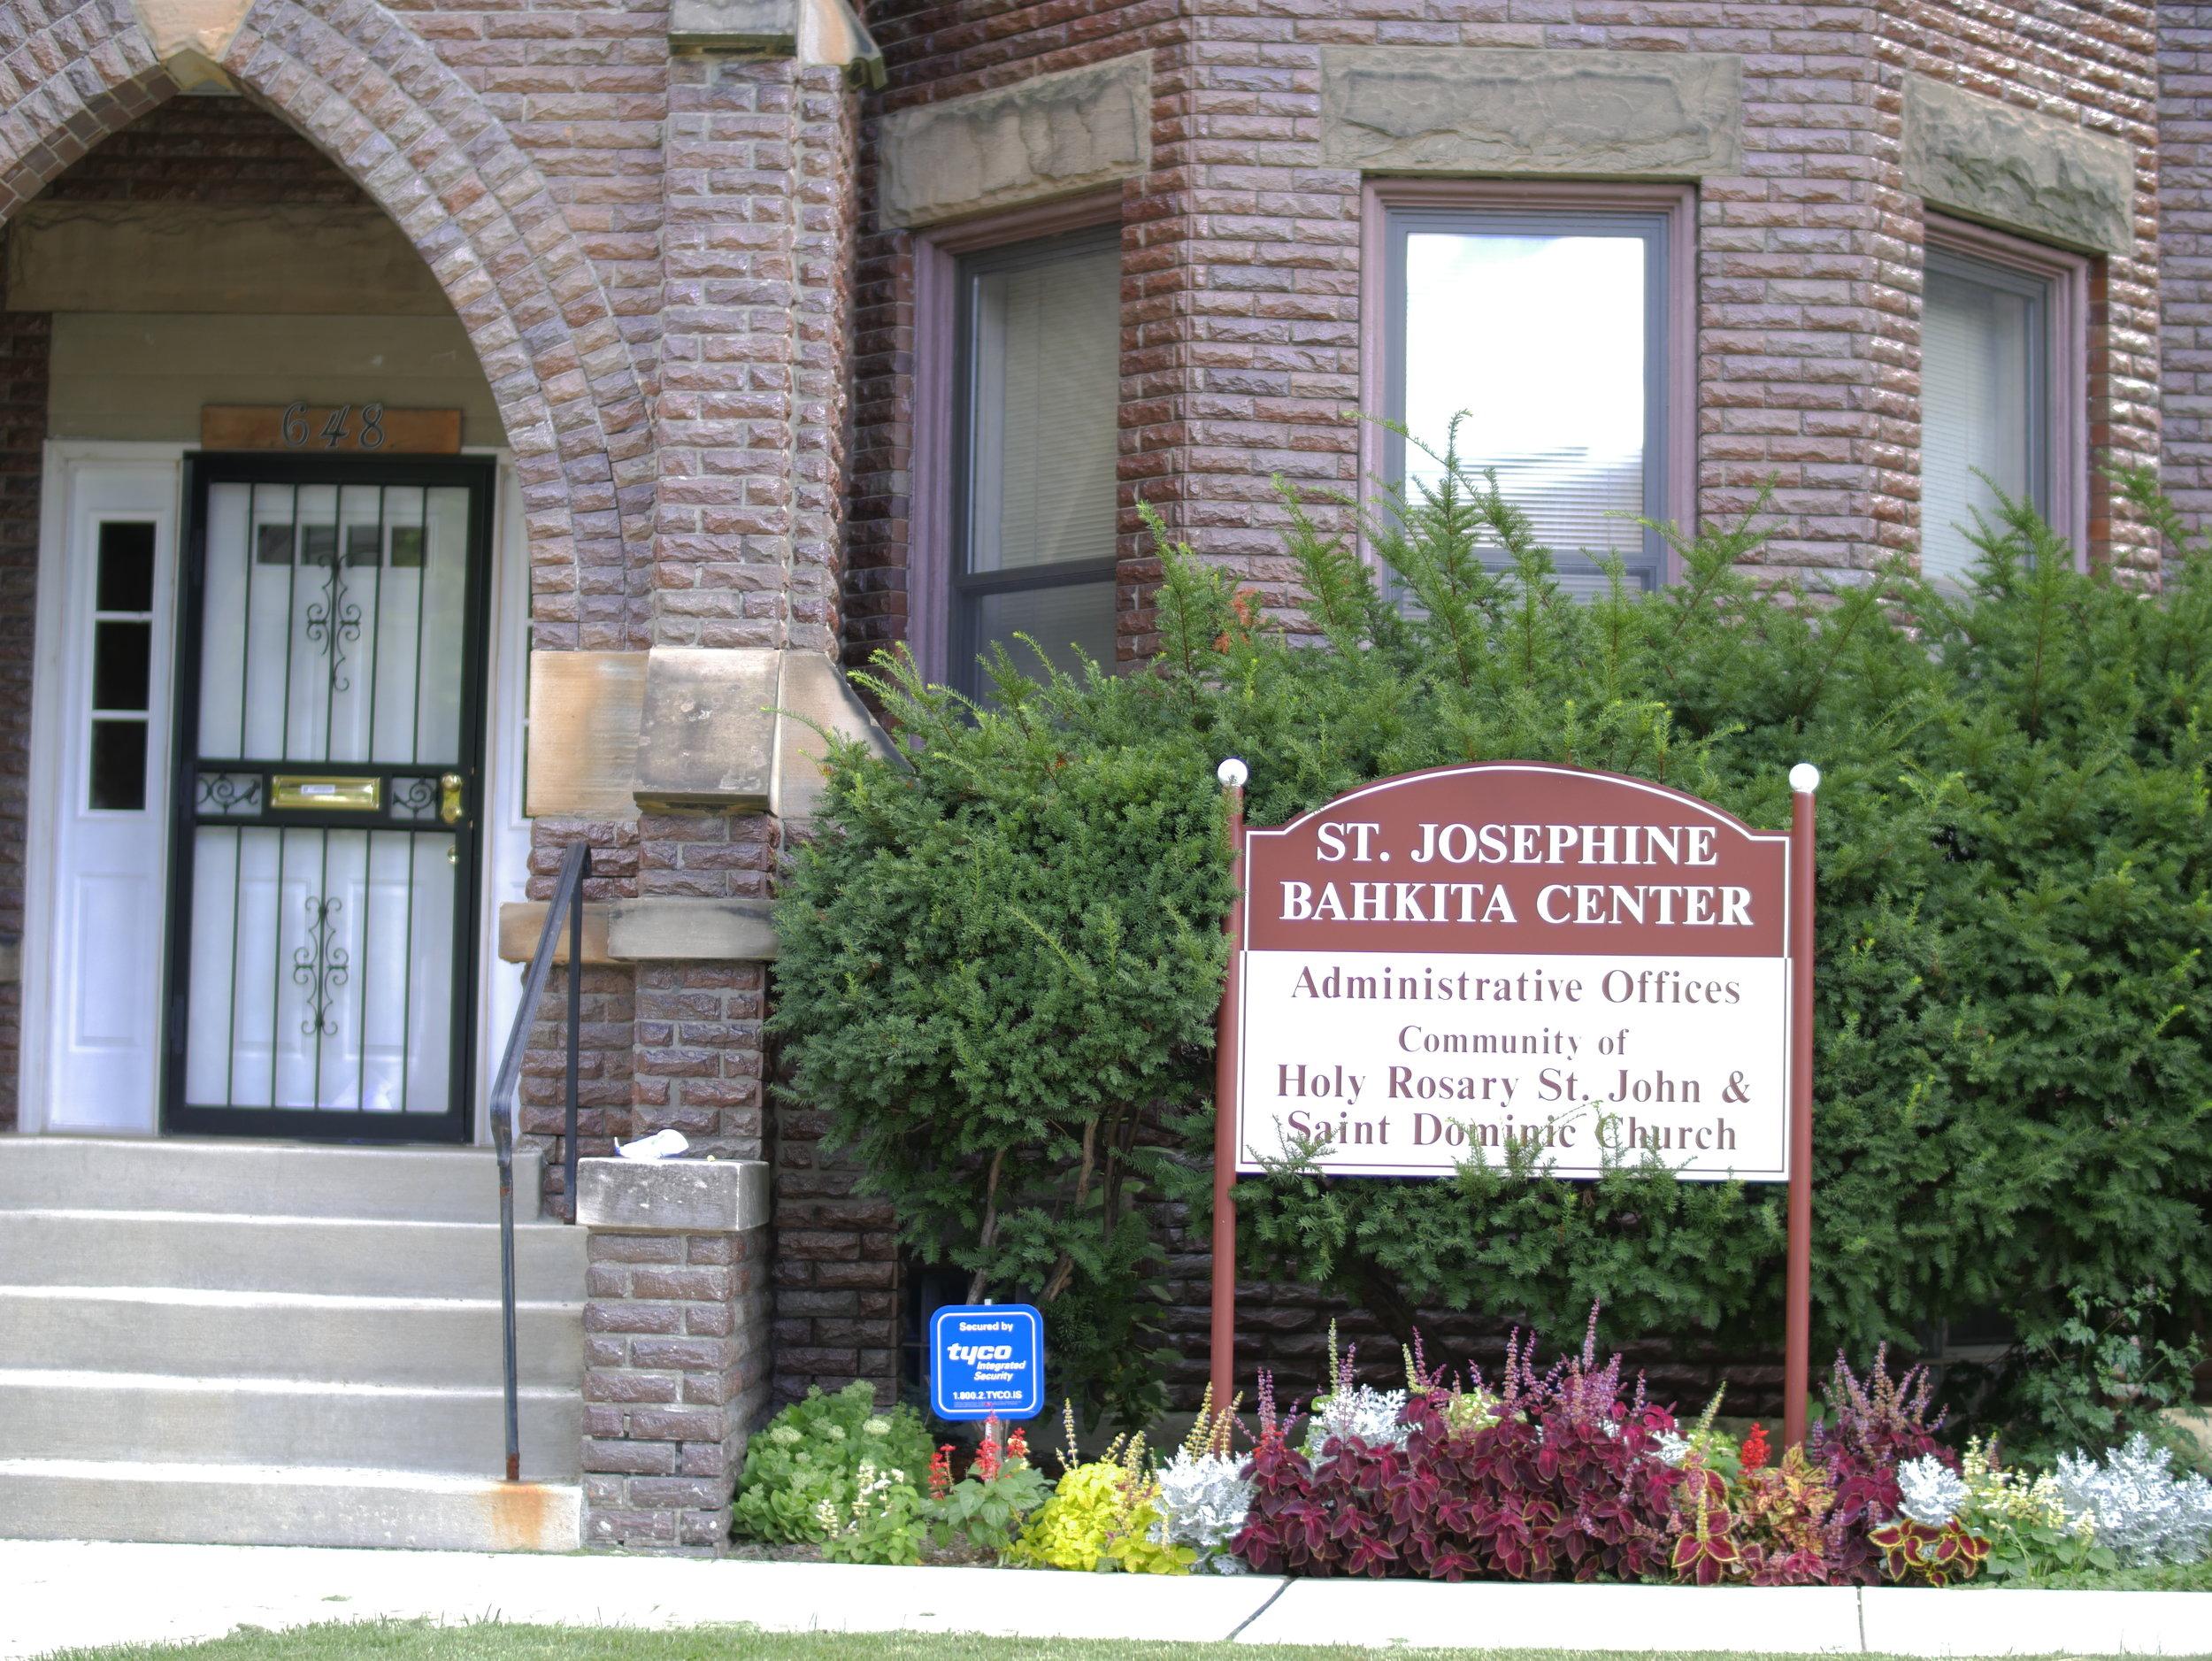 St. Josephine Bahita Center